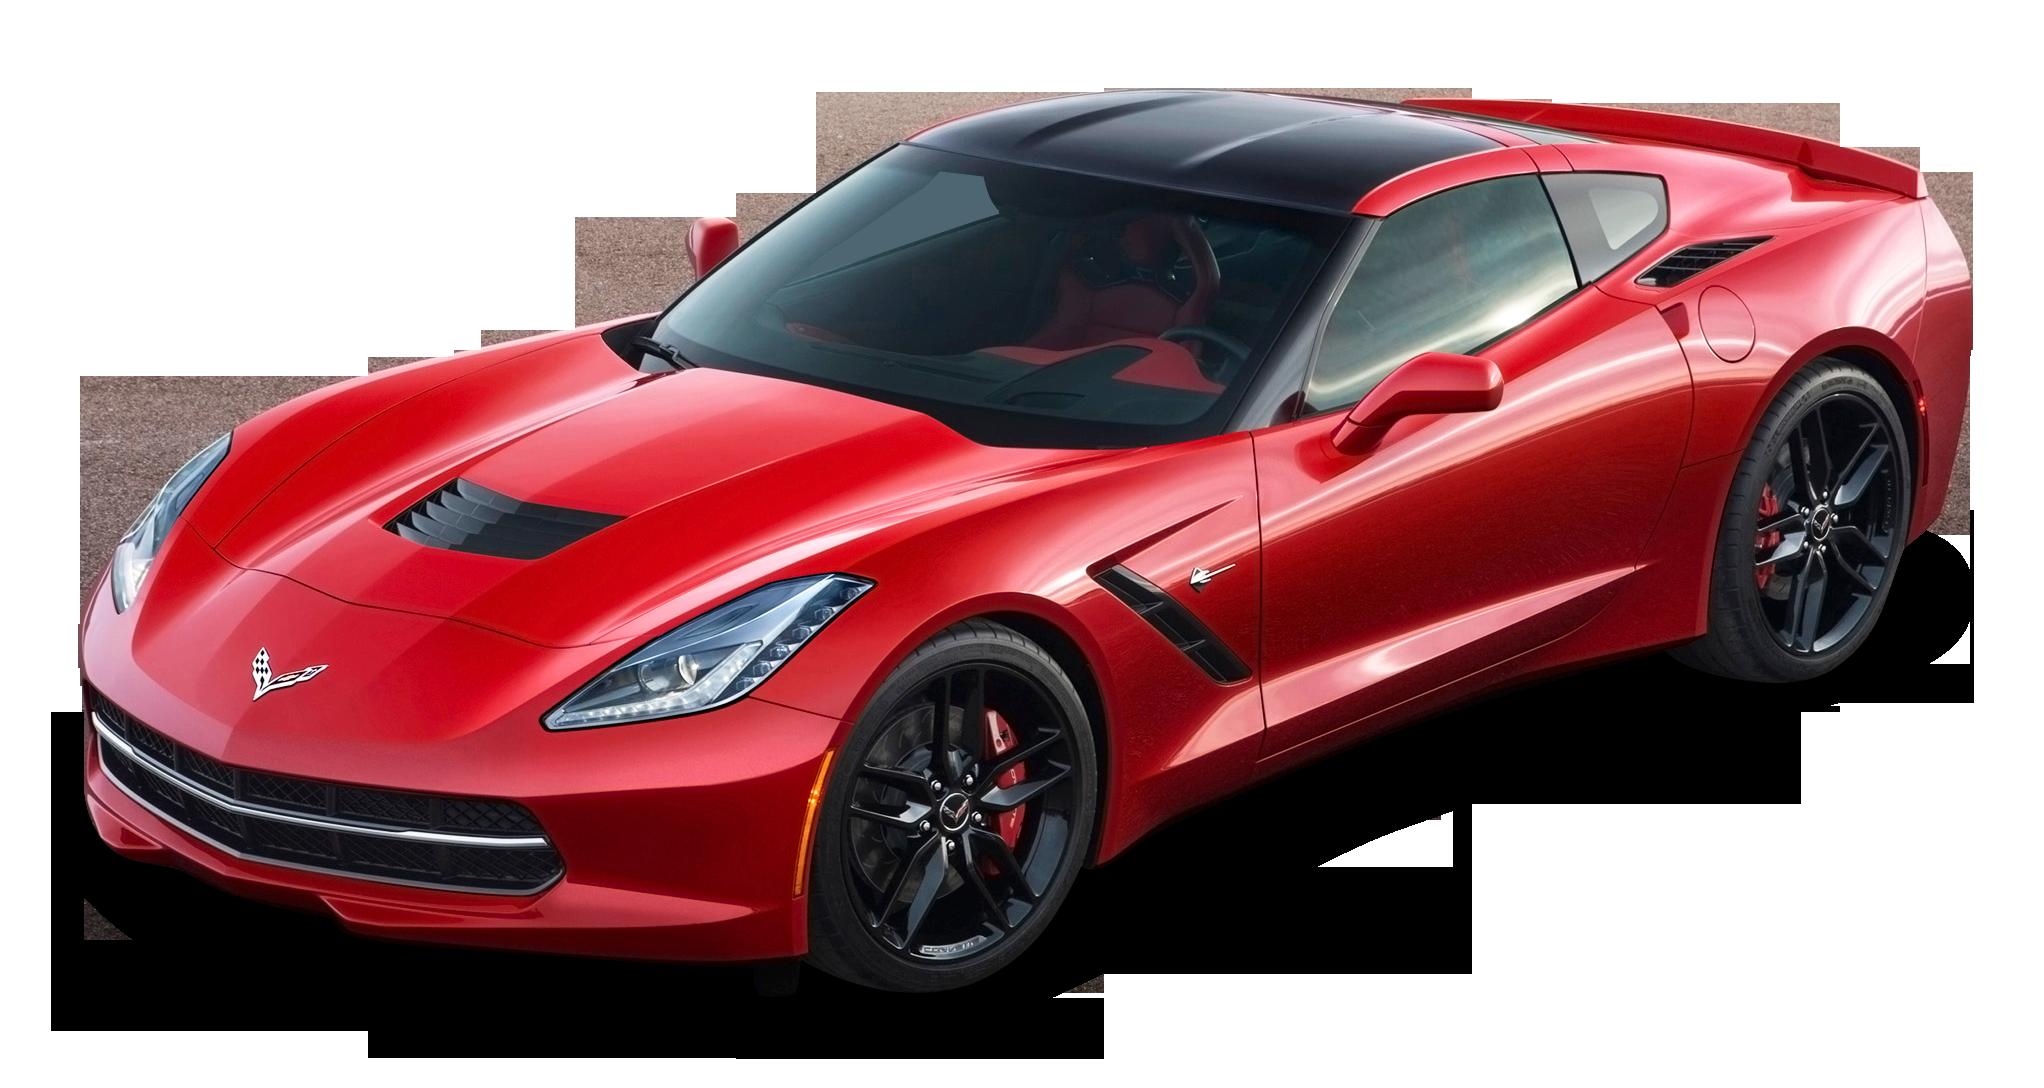 Red Chevrolet Corvette Stingray Top View Car